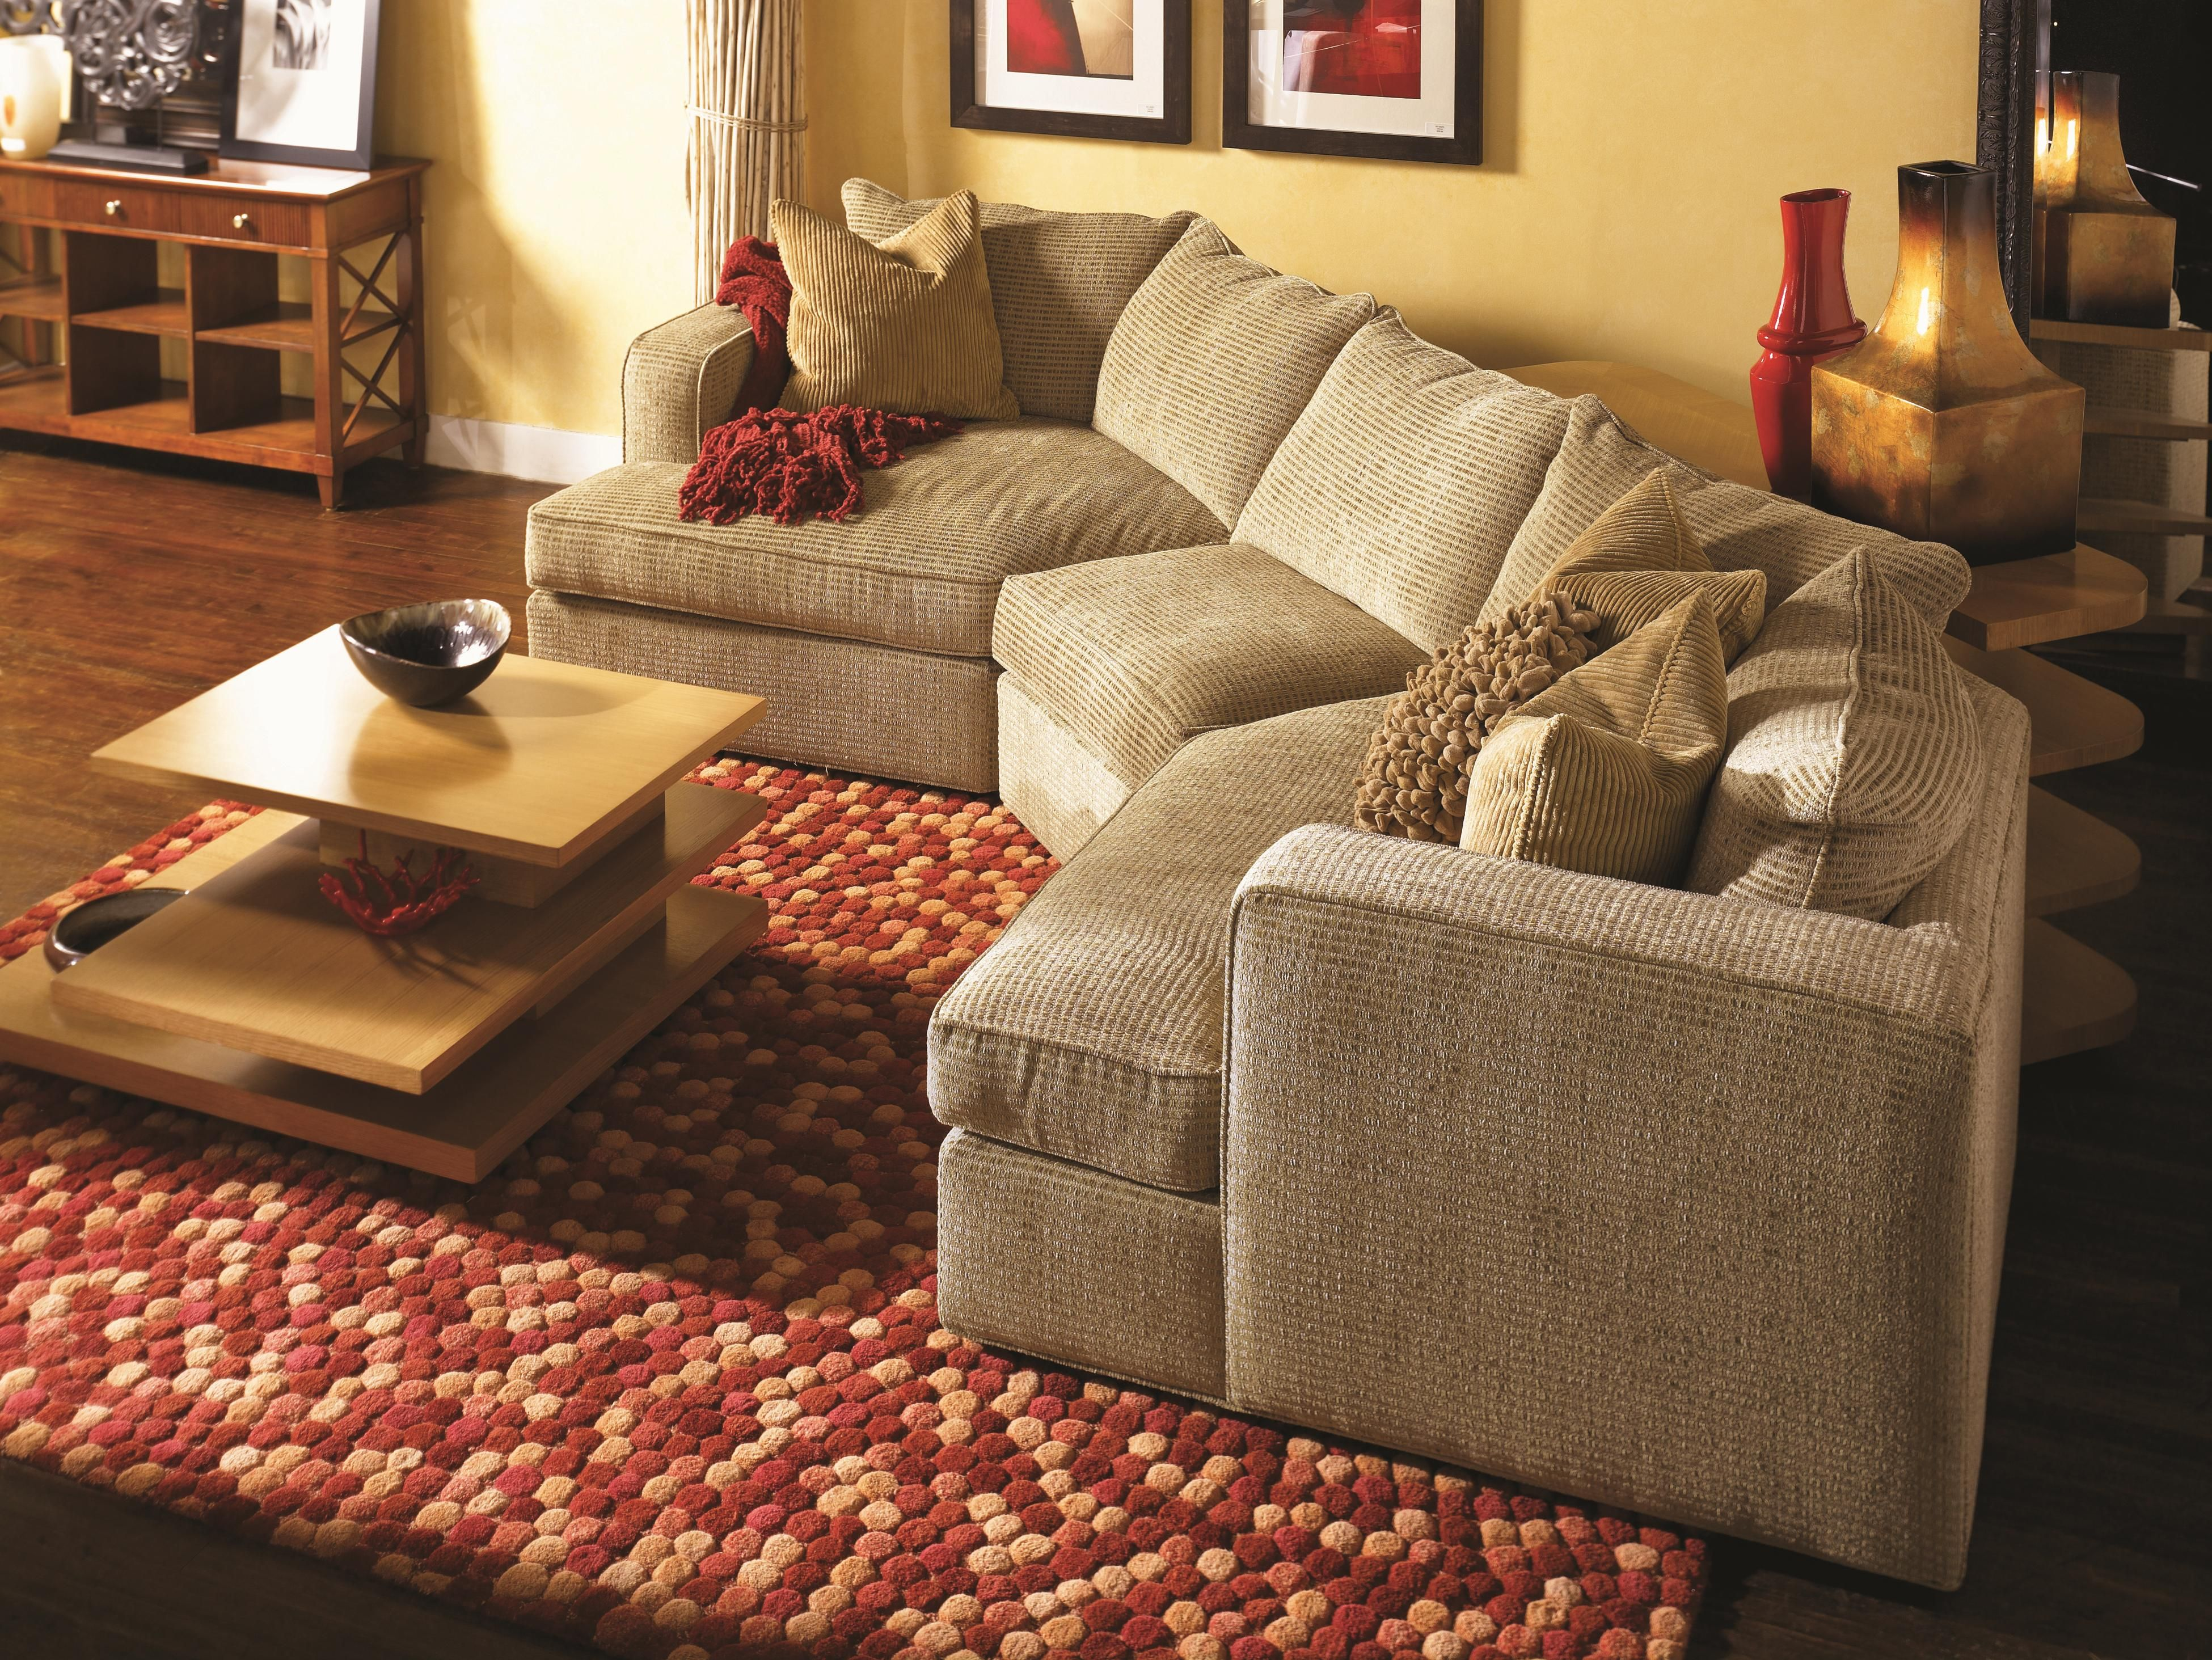 Milford Sectional Sofa by Norwalk   Home   Pinterest   Mattress ...